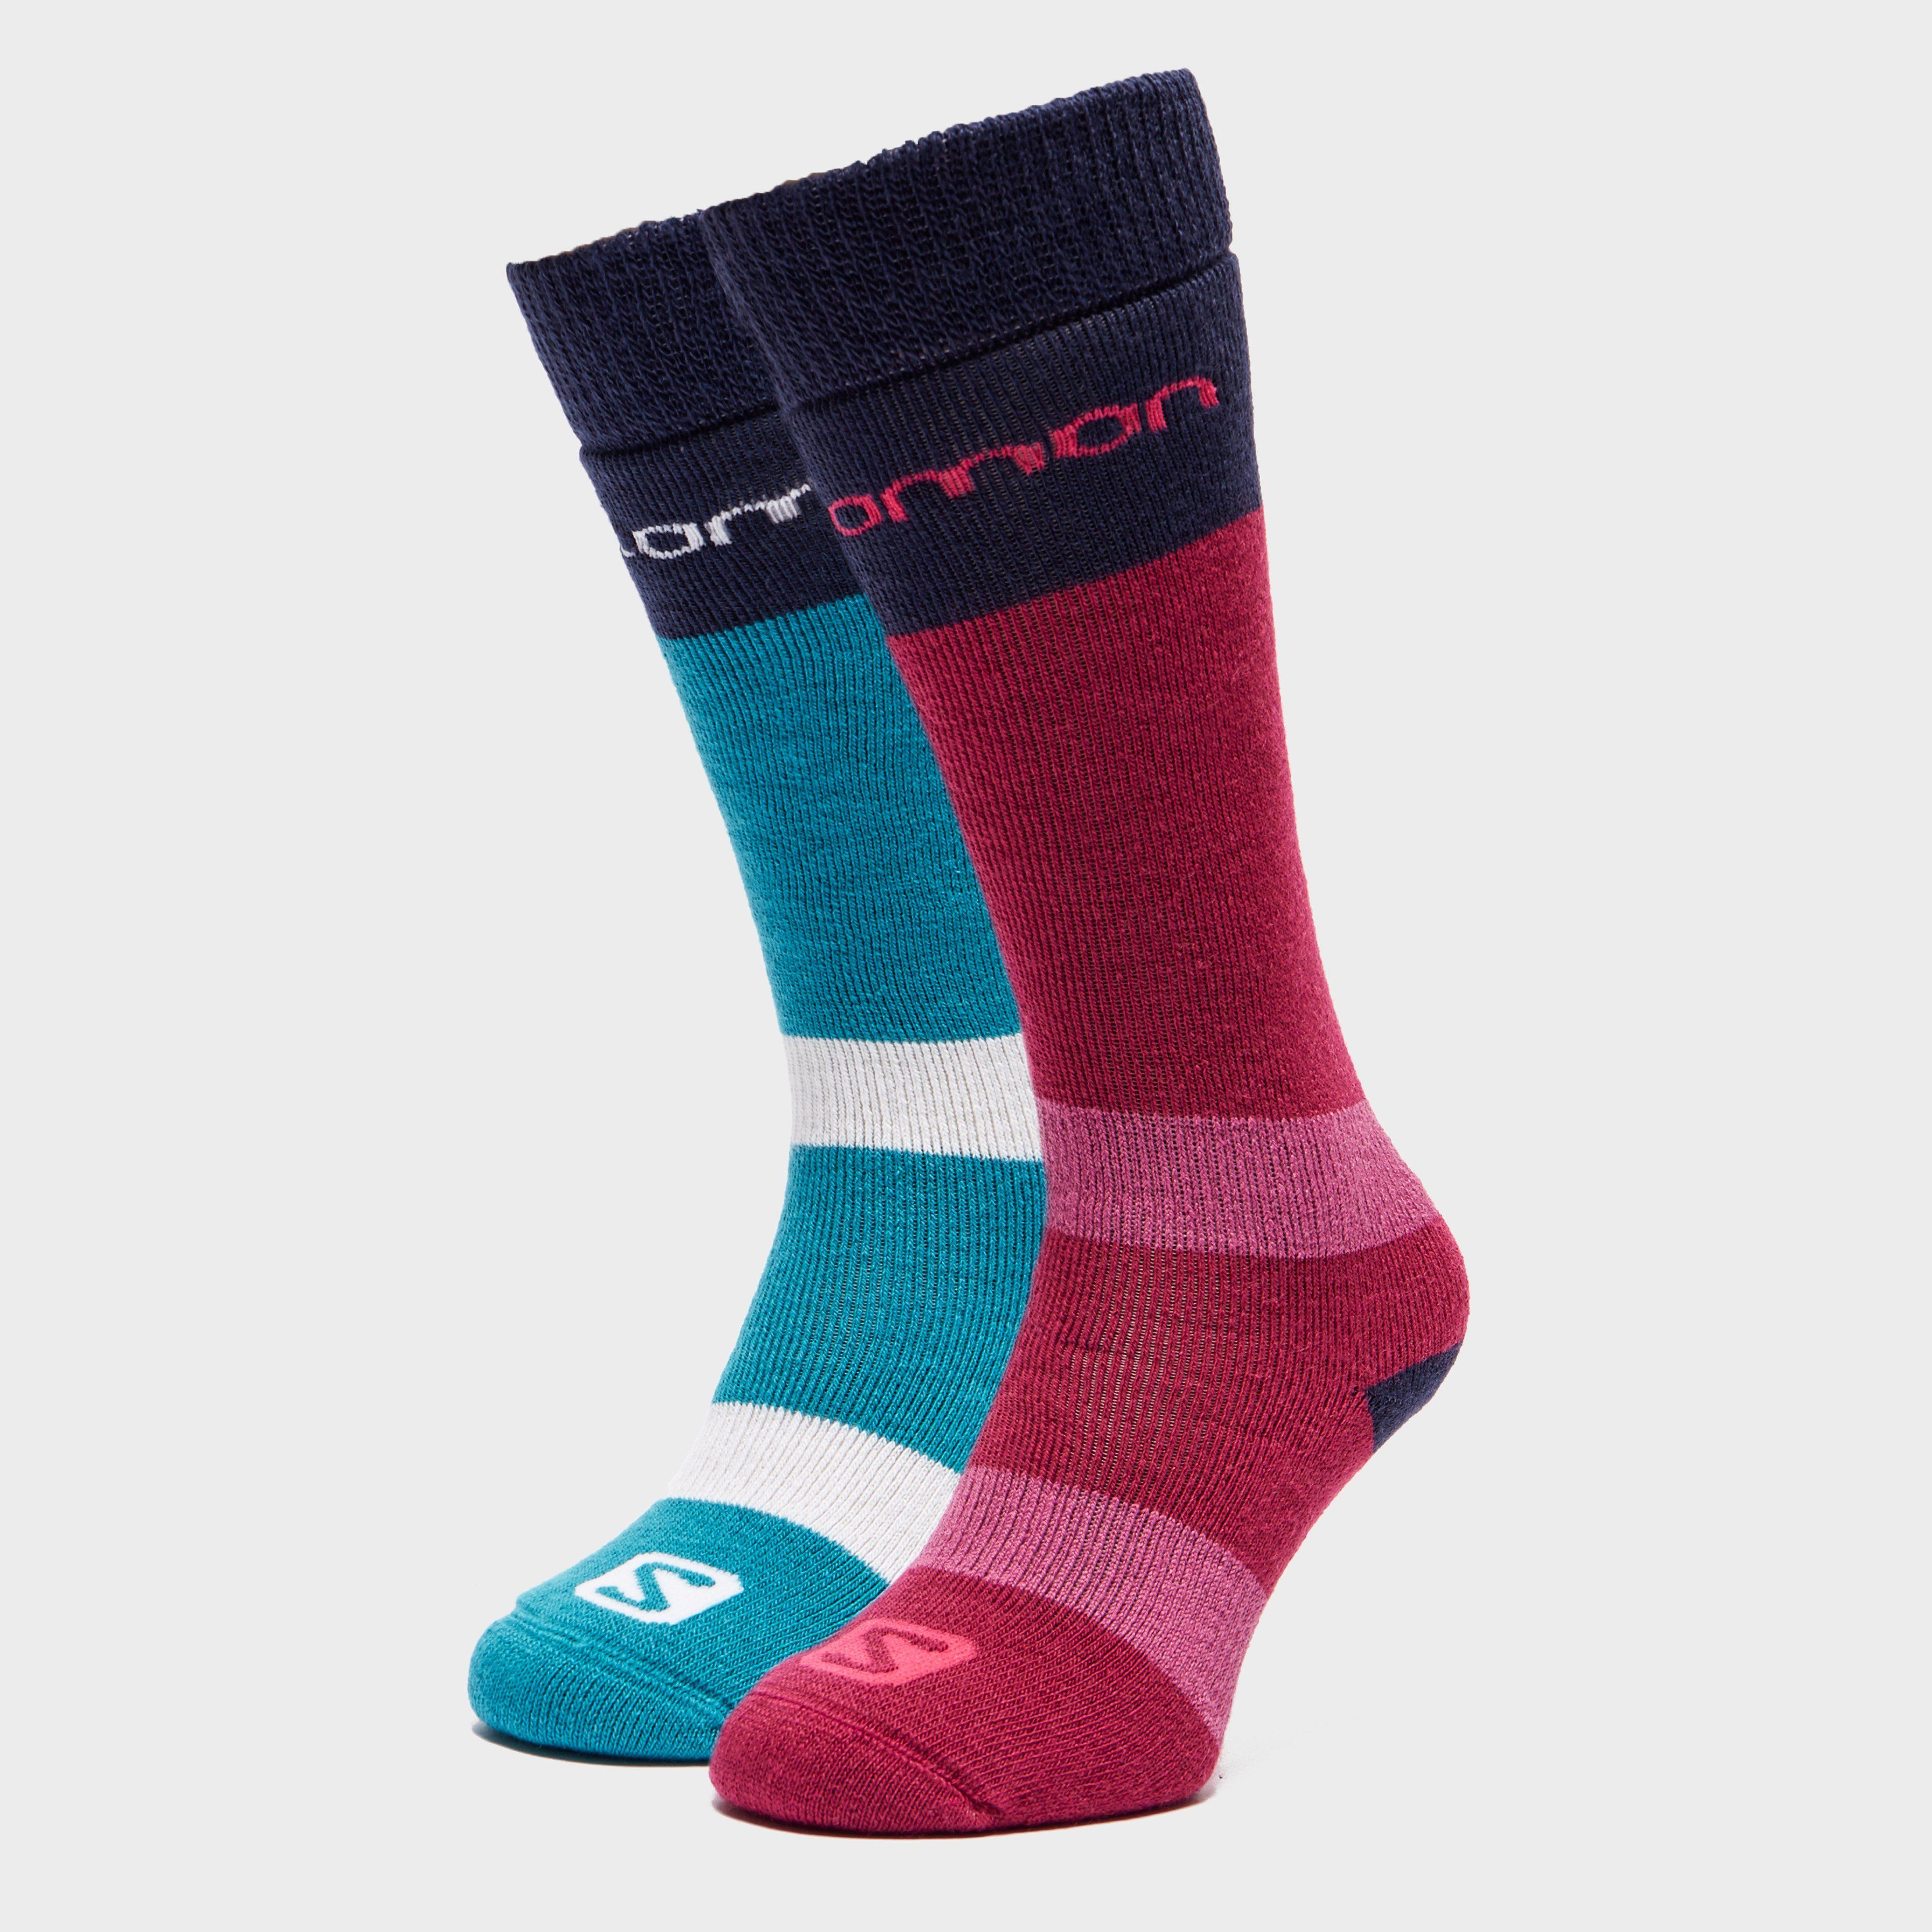 SALOMON SOCKS Women's All Round Ski Sock